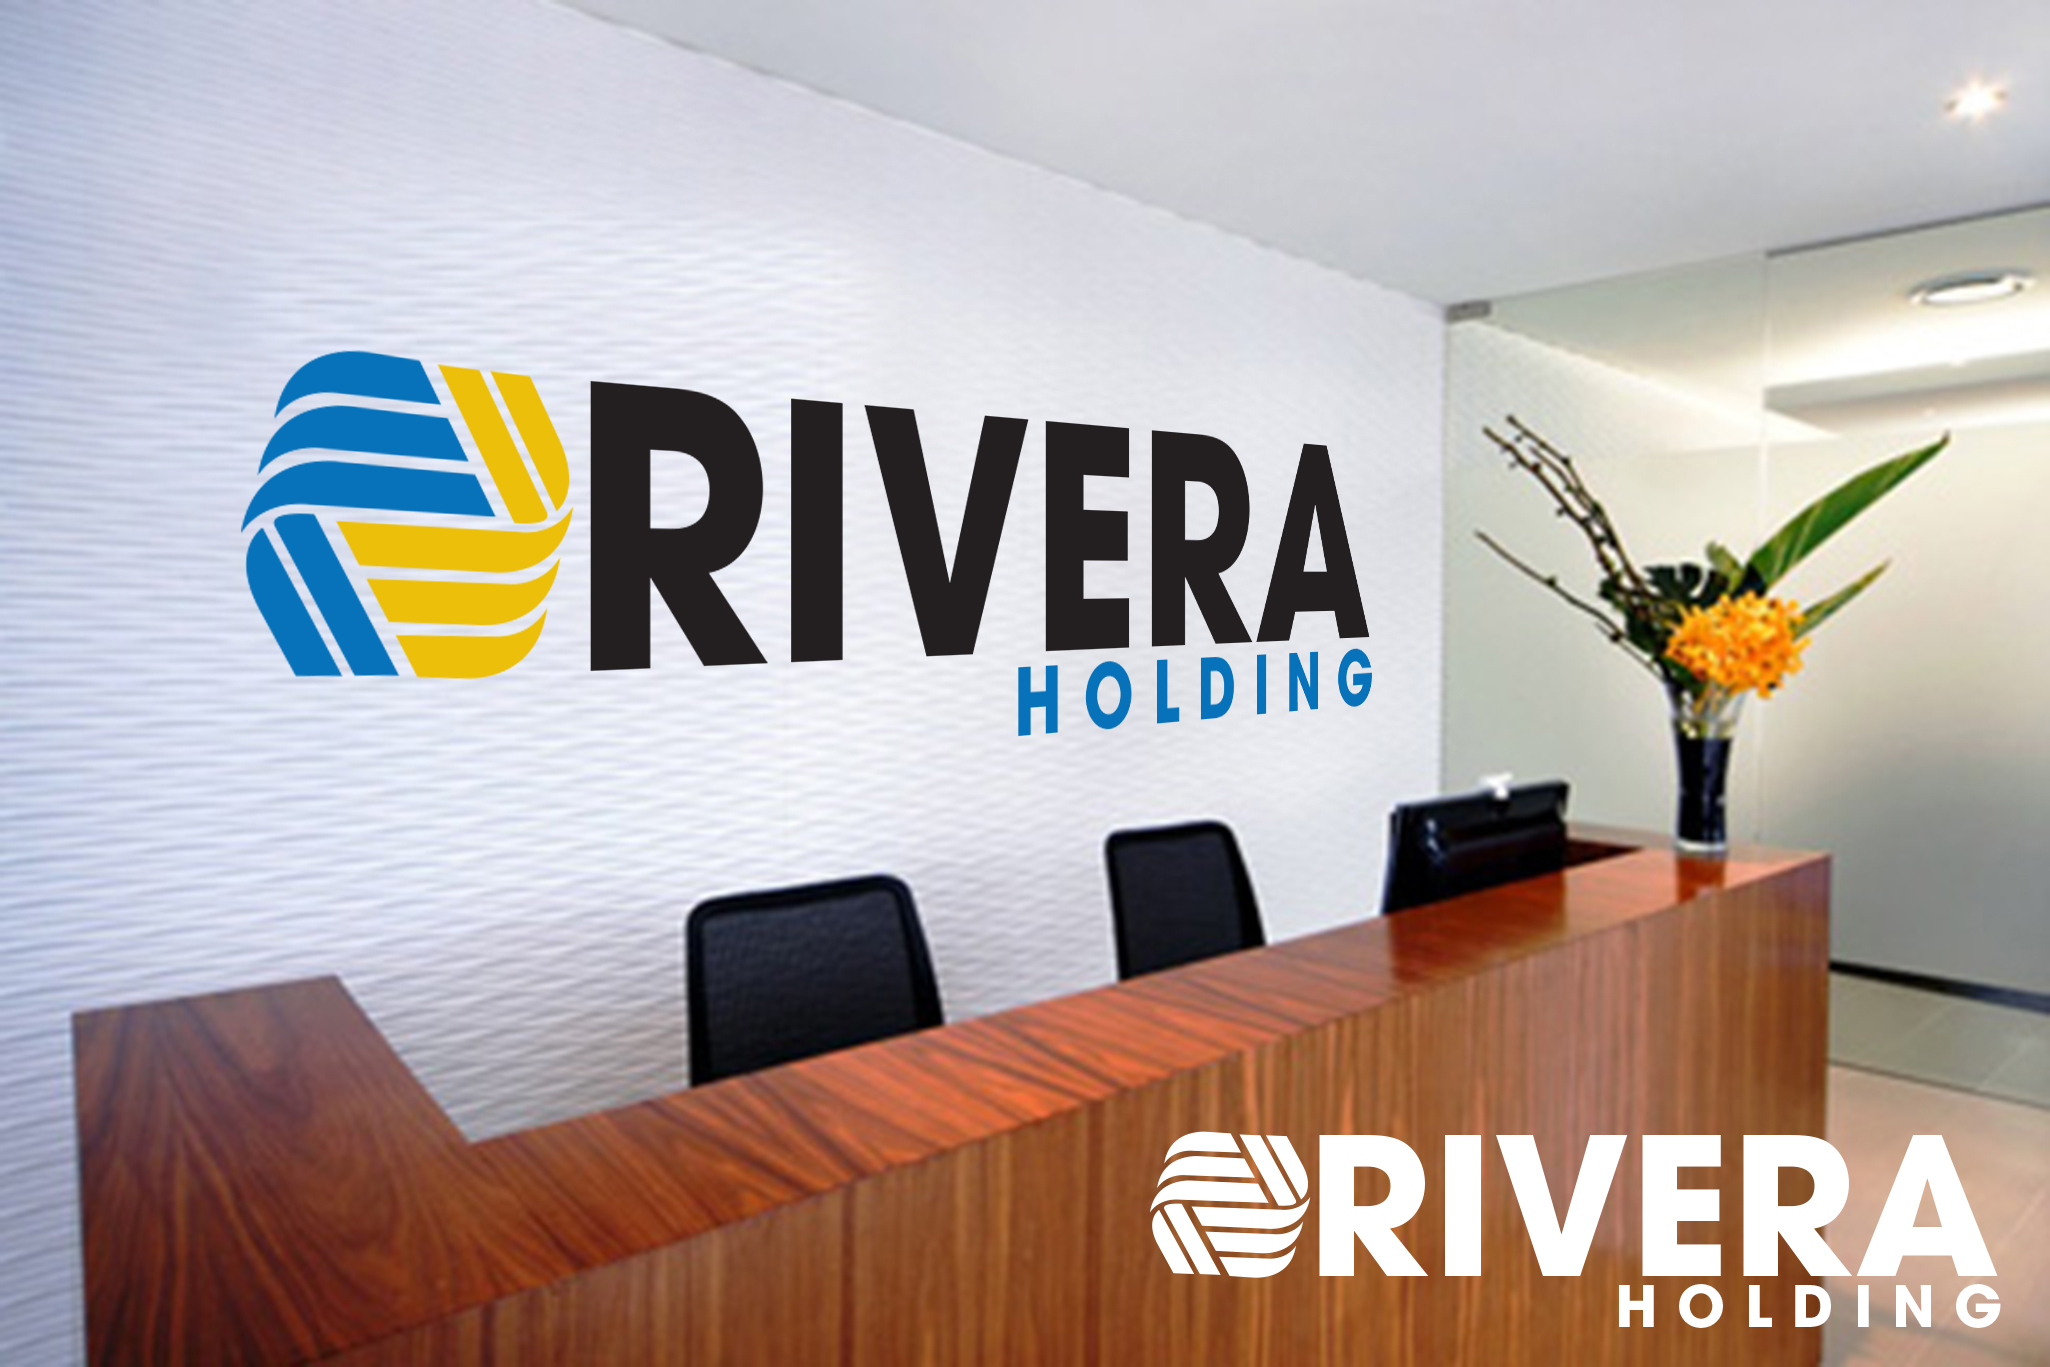 Logo Design by Rob King - Entry No. 6 in the Logo Design Contest RIVERA HOLDING Logo Design.